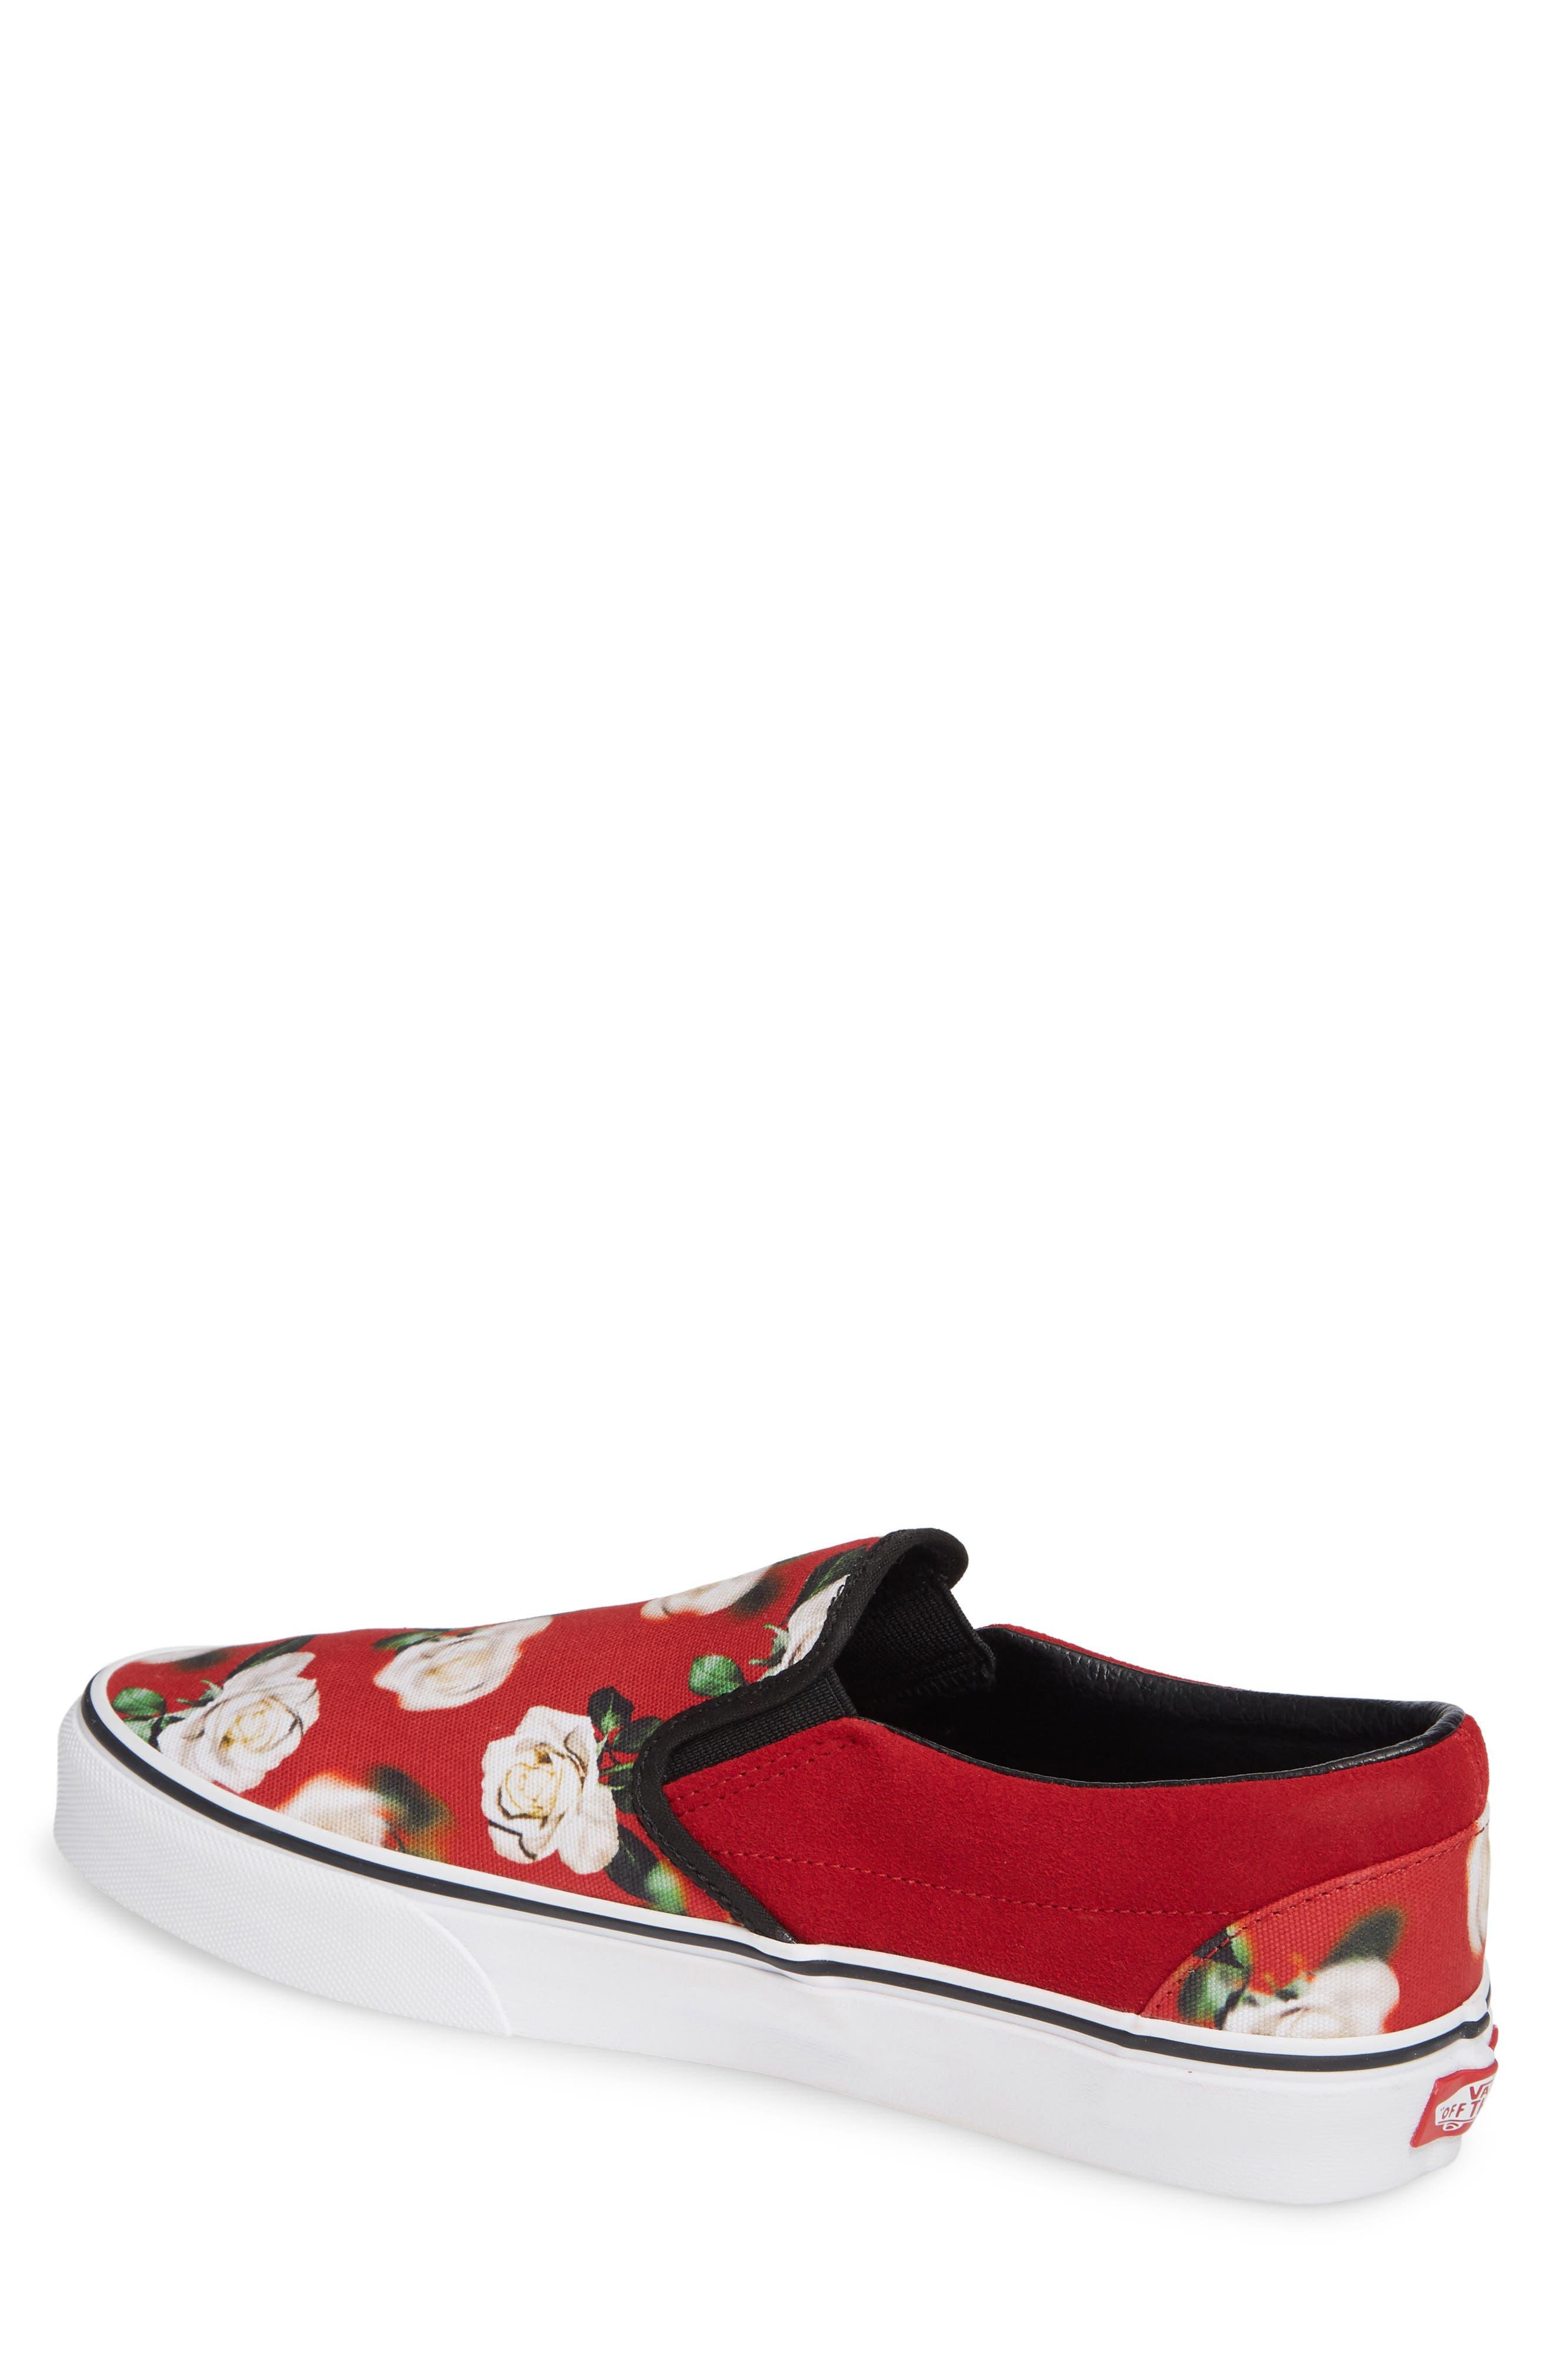 'Classic' Slip-On Sneaker,                             Alternate thumbnail 2, color,                             CHILI PEPPER/ ROMANTIC FLORAL